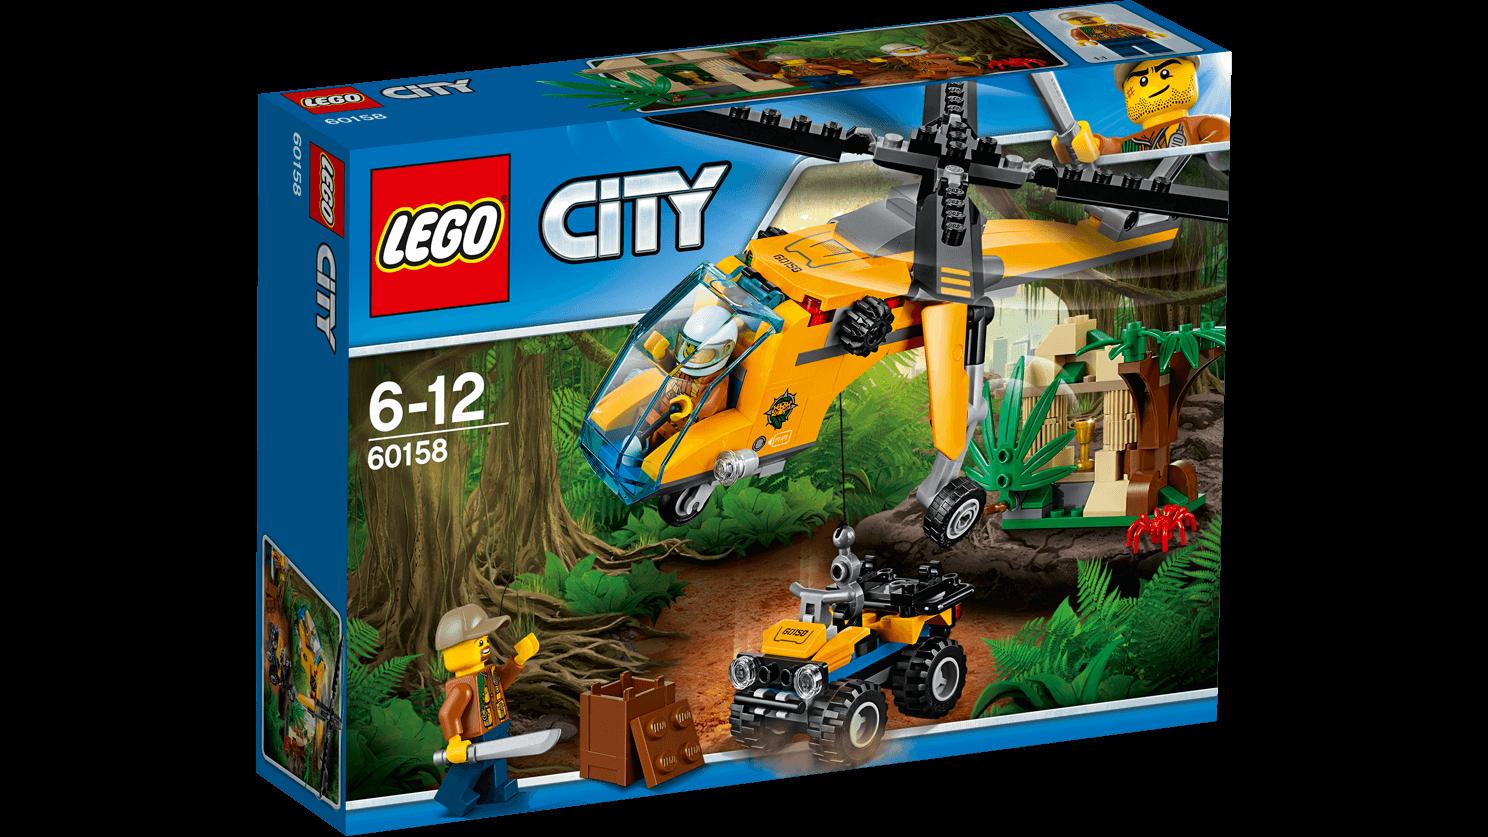 LEGO CITY JUNGLE CARGO HELICOPTER 201PCS/PZS (6-12AGE/EDADES) 60158